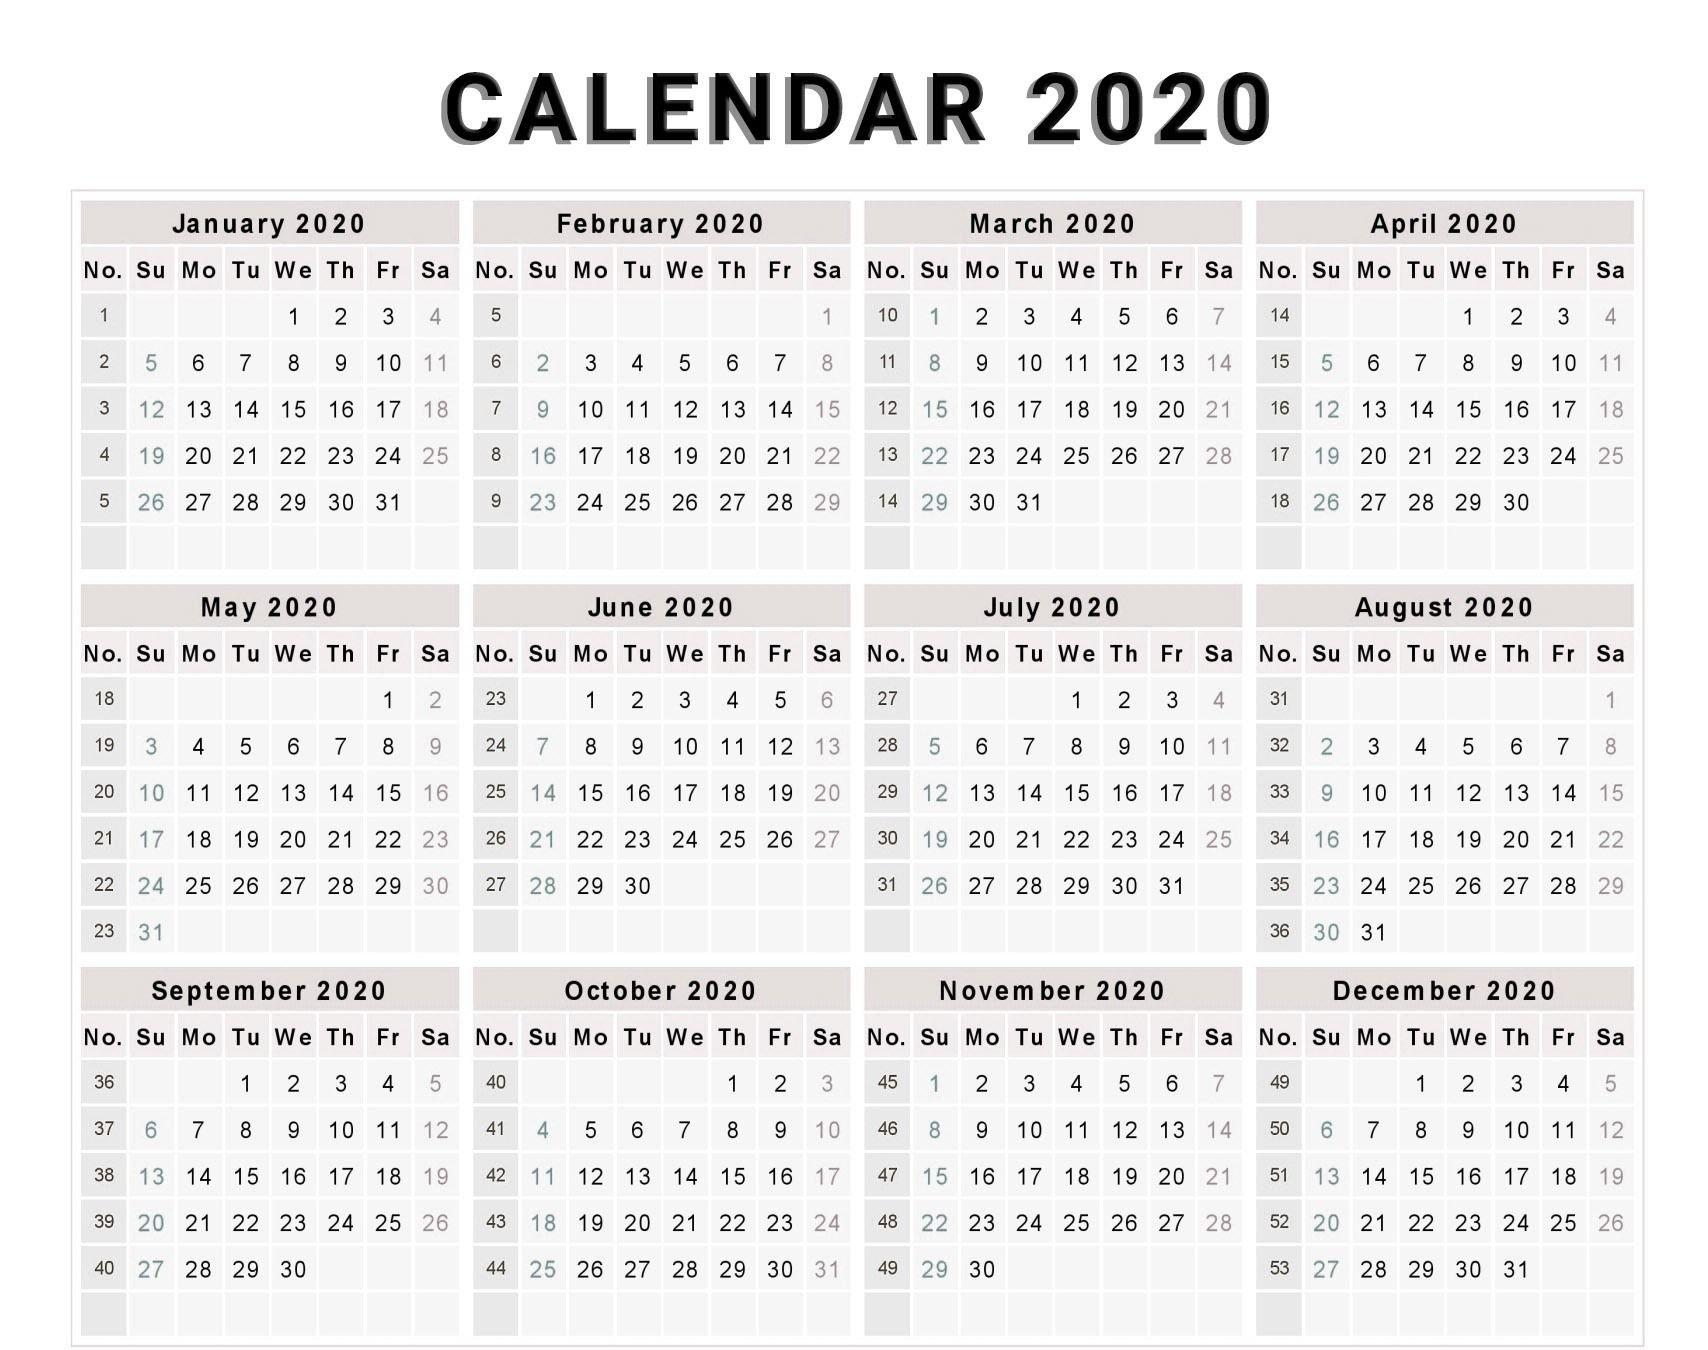 Free Editable 2020 Calendar Printable Template | Calendar Sap 52 Week Numbered Calendar